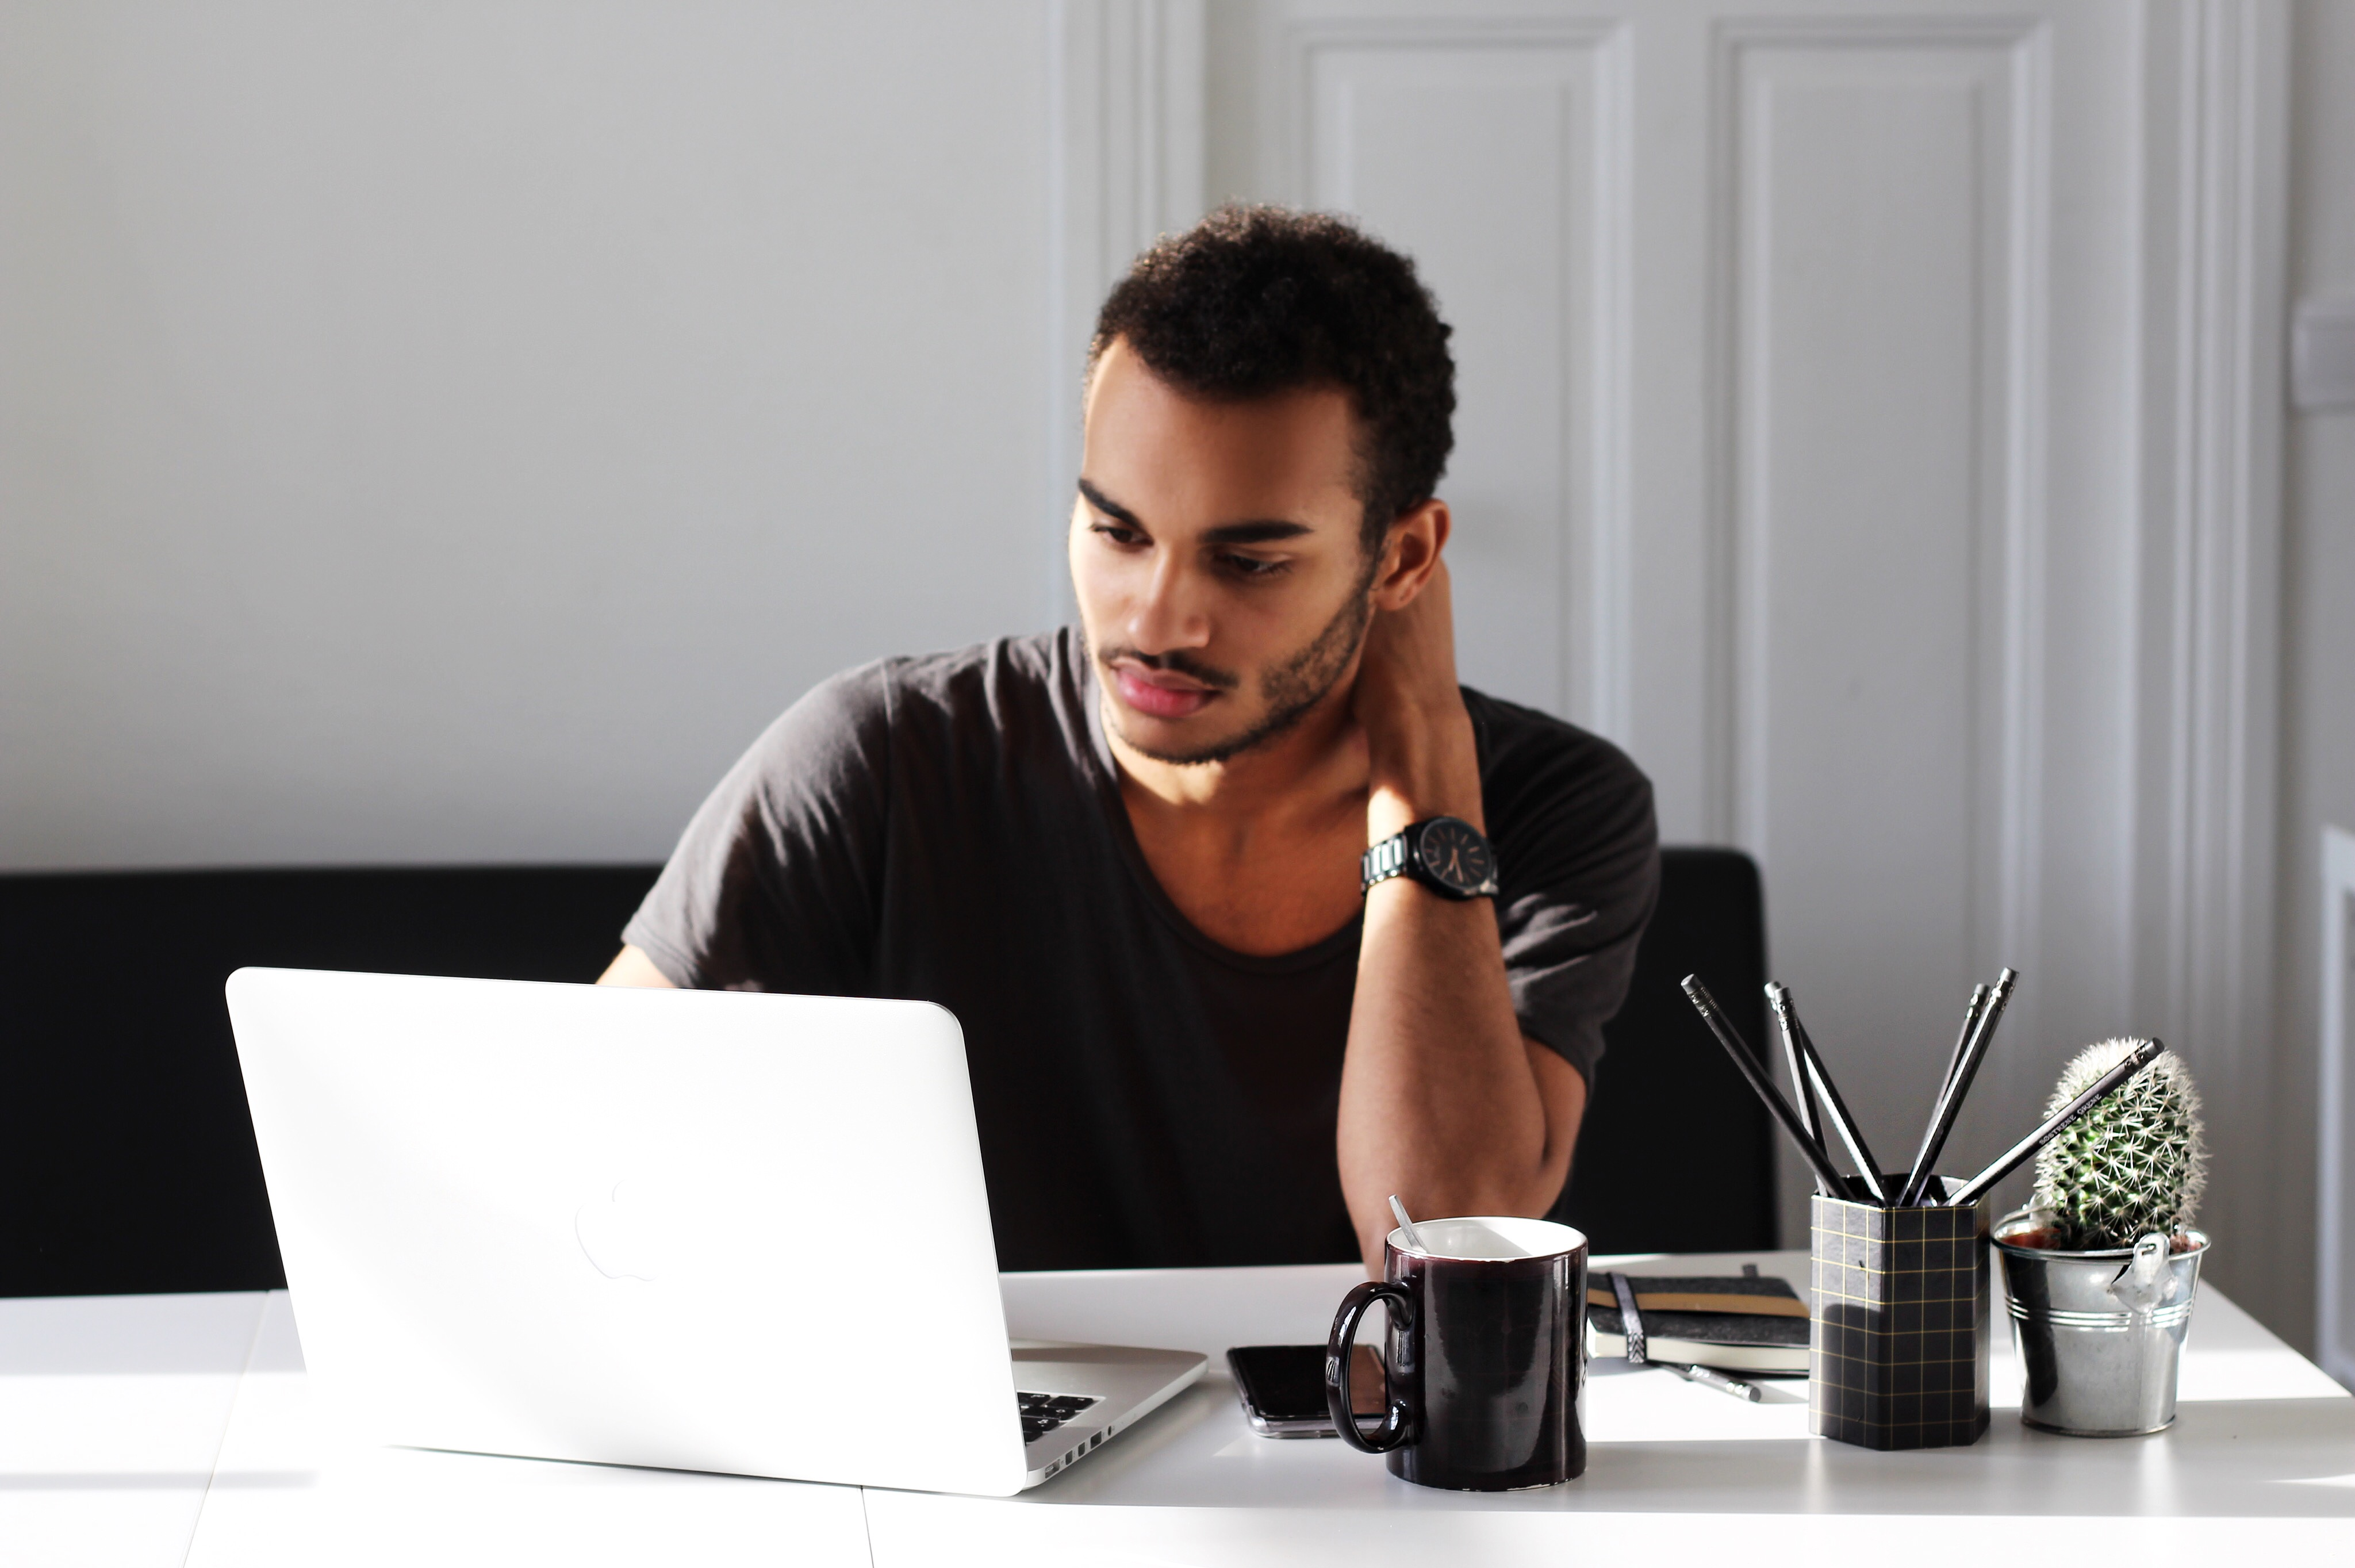 mrfoures-comfy-cosy-look-man-blogger-influencer-blog-mode-homme-blogueur-homme-organisation-travail-comment-être-organisé